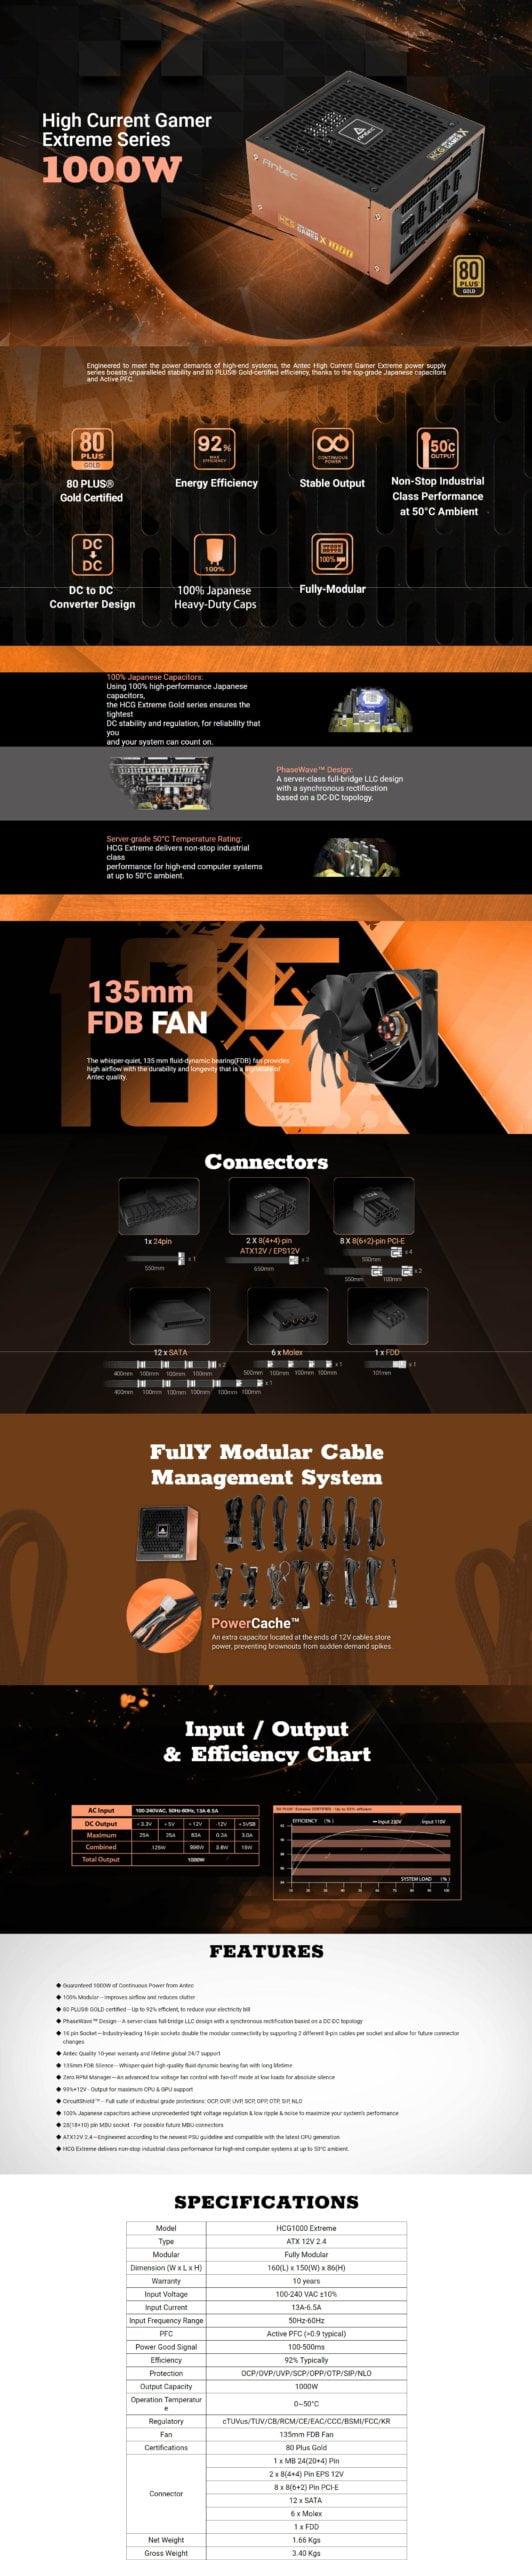 Antec High Current Gamer 1000W Extreme Gold Fully Modular PSU